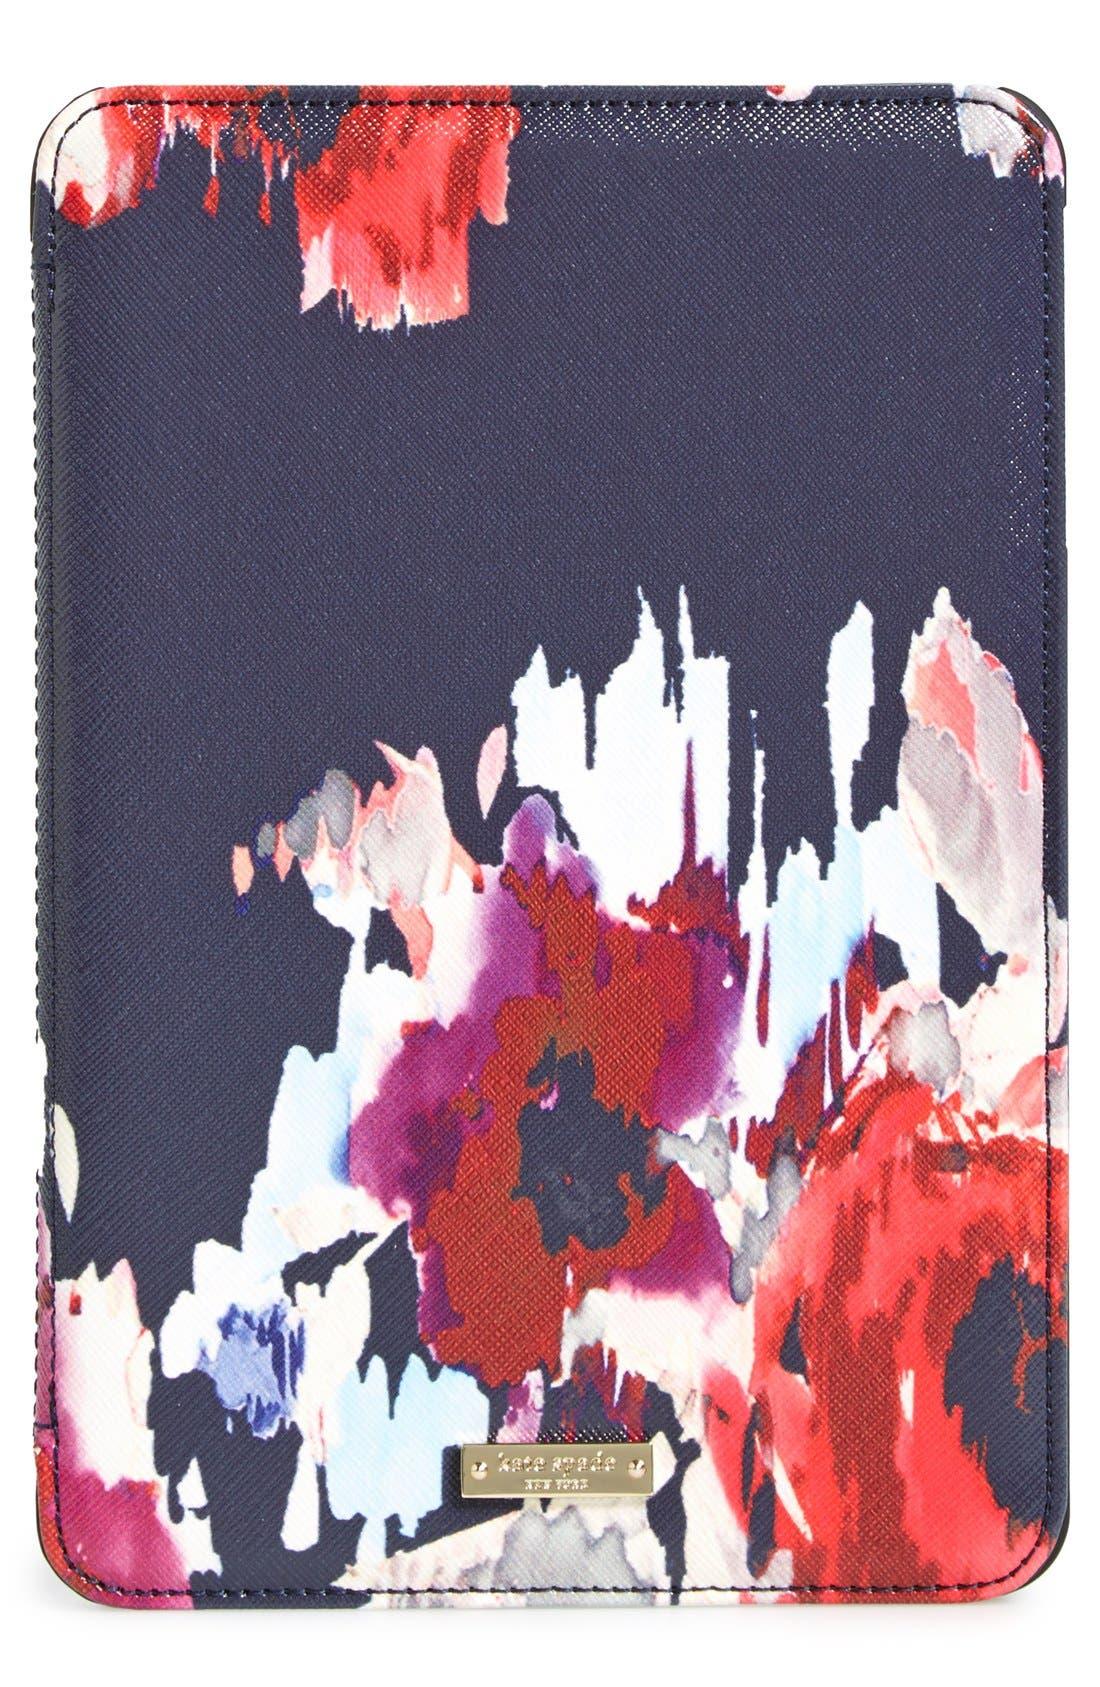 Alternate Image 1 Selected - kate spade new york 'hazy floral' iPad Mini hardcase folio